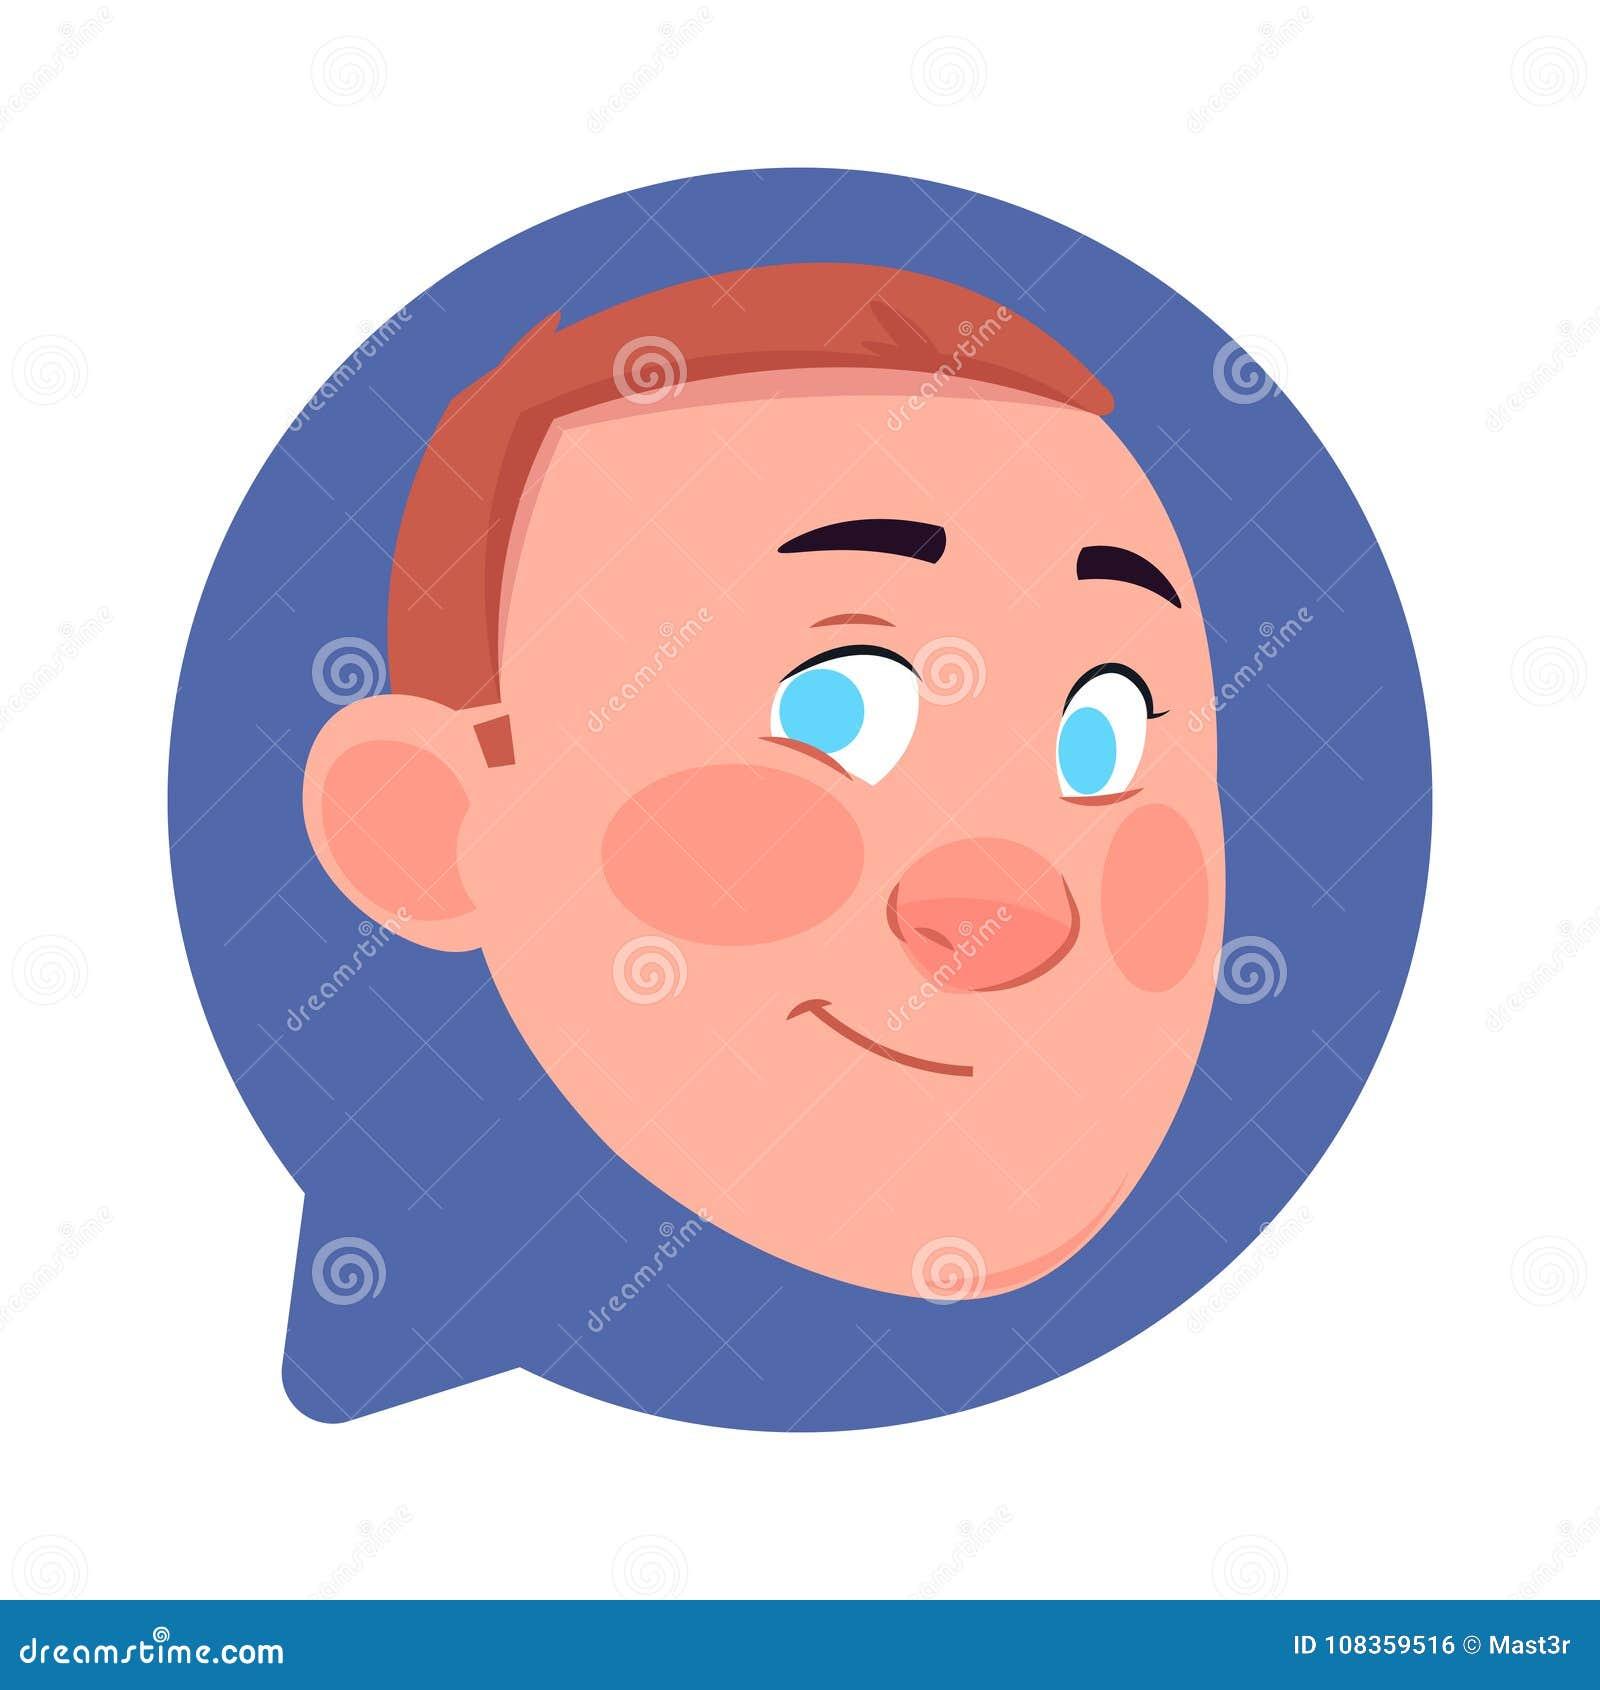 Cabeza masculina del icono del perfil en la burbuja aislada, retrato de la charla del personaje de dibujos animados de Avatar del